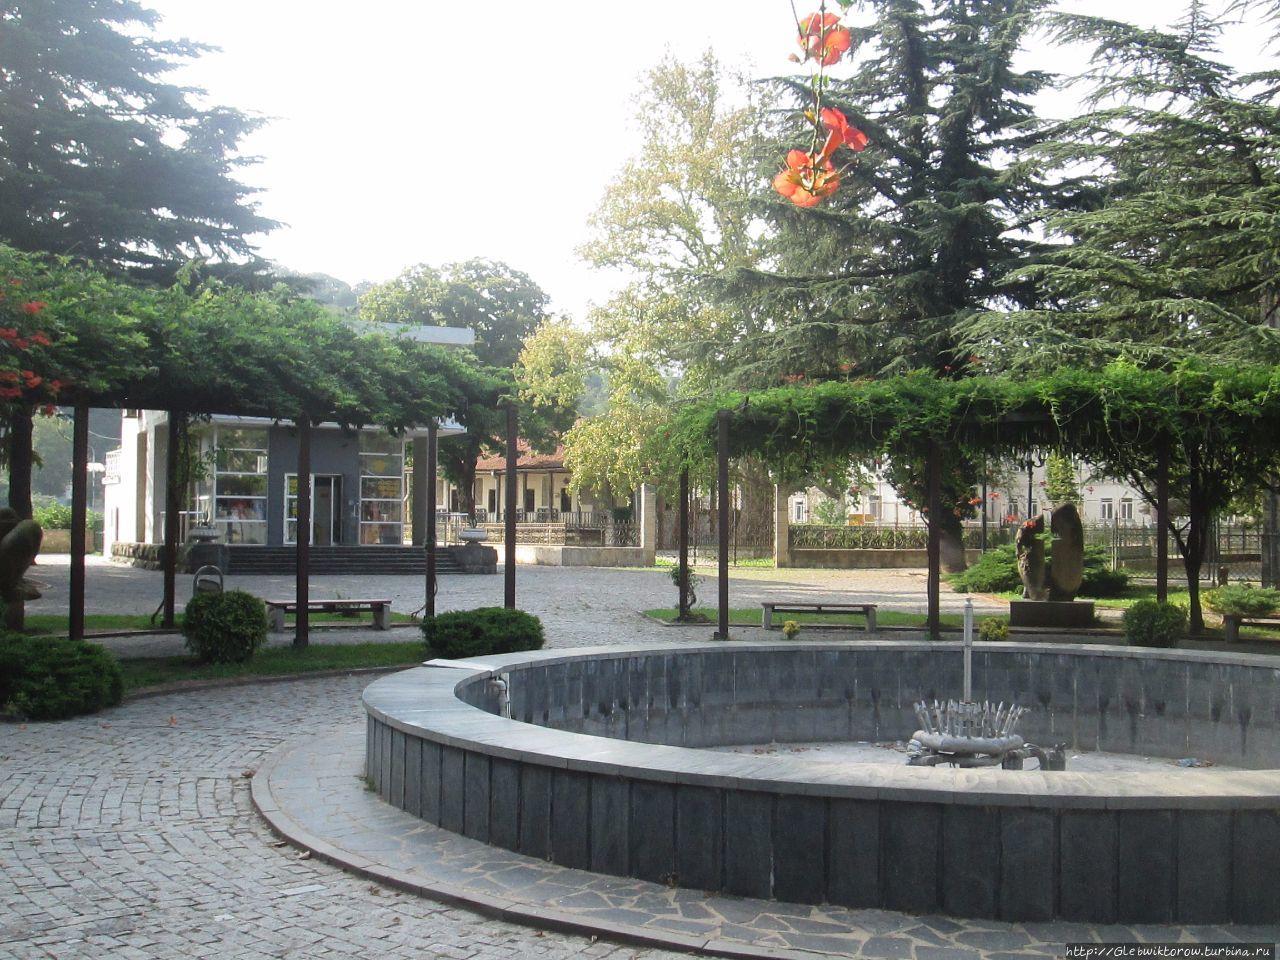 Парк культуры и отдыха Бесариона Габашвили Кутаиси, Грузия